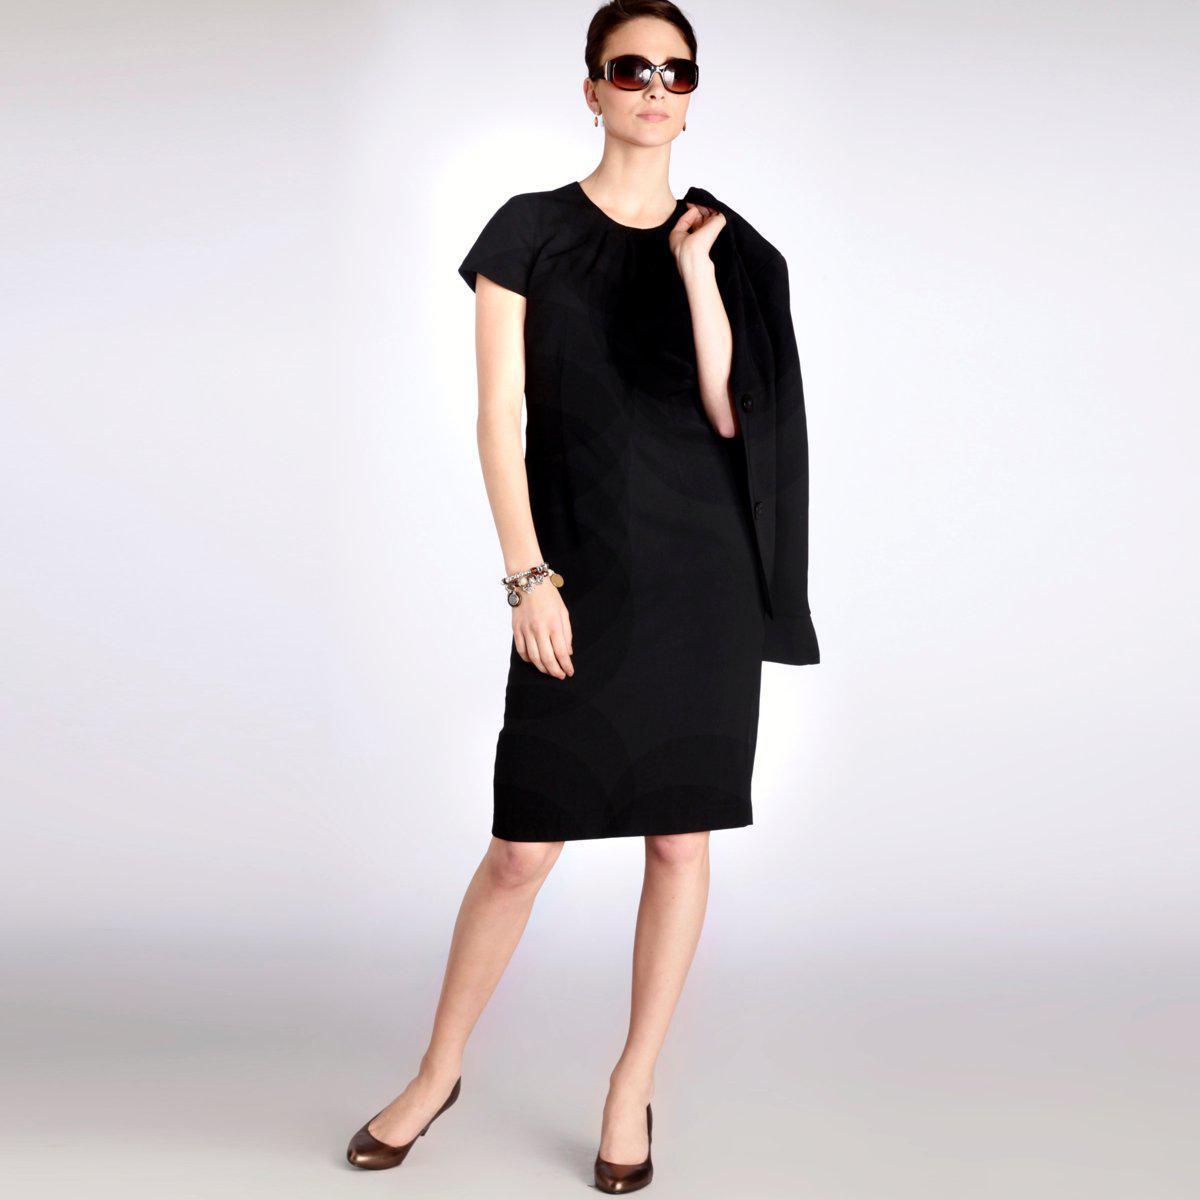 3a0d644741e6 Βραδυνα Φορεματα LaRedoute Φθινόπωρο 2011 Κωδ. 324205281